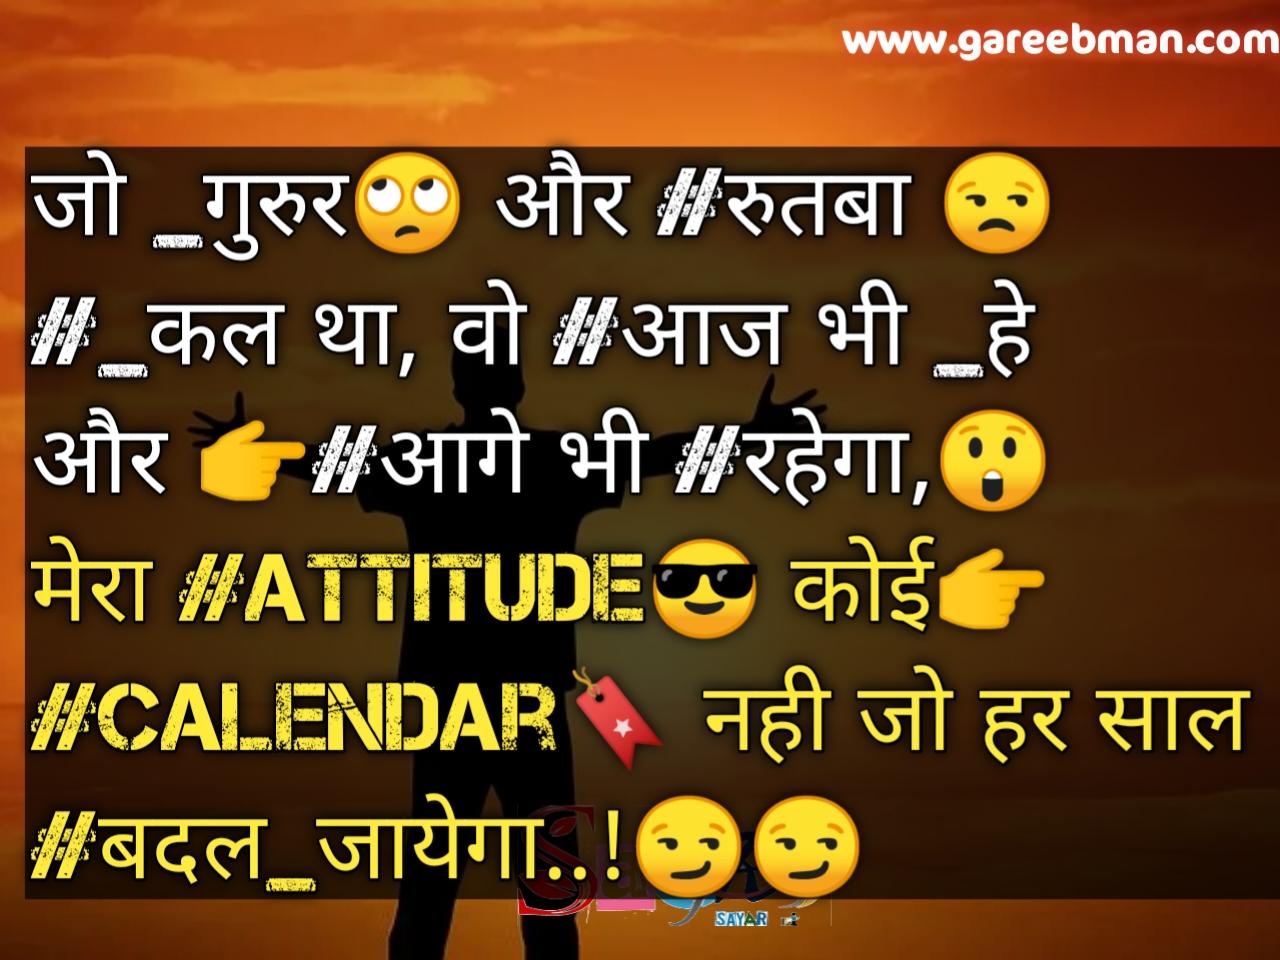 boys attitude image shayari hindi2021 hd image